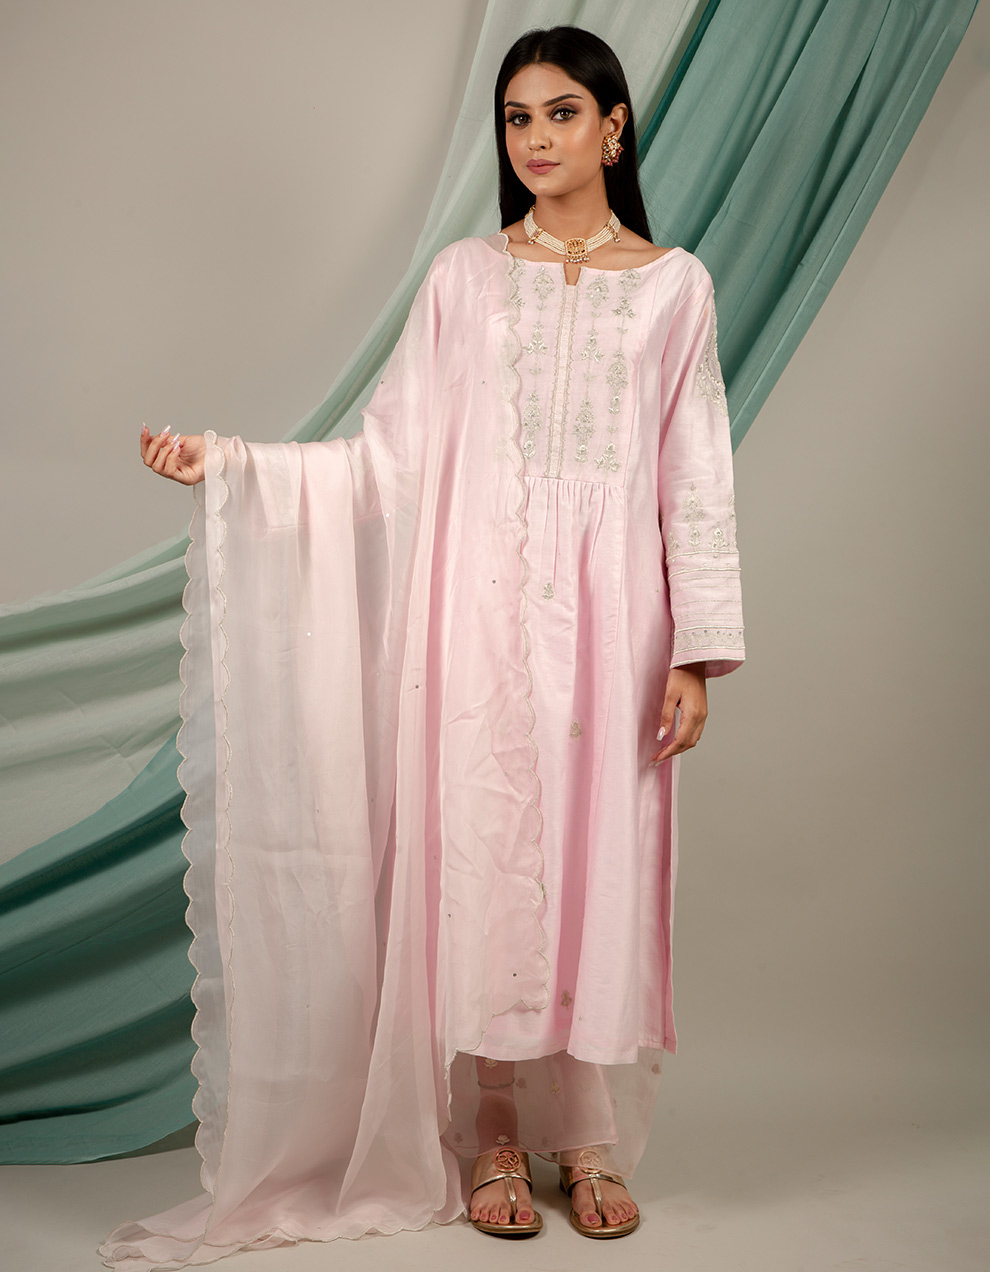 trendy look light pink color scalloped and cheeta work organza dupatta designs